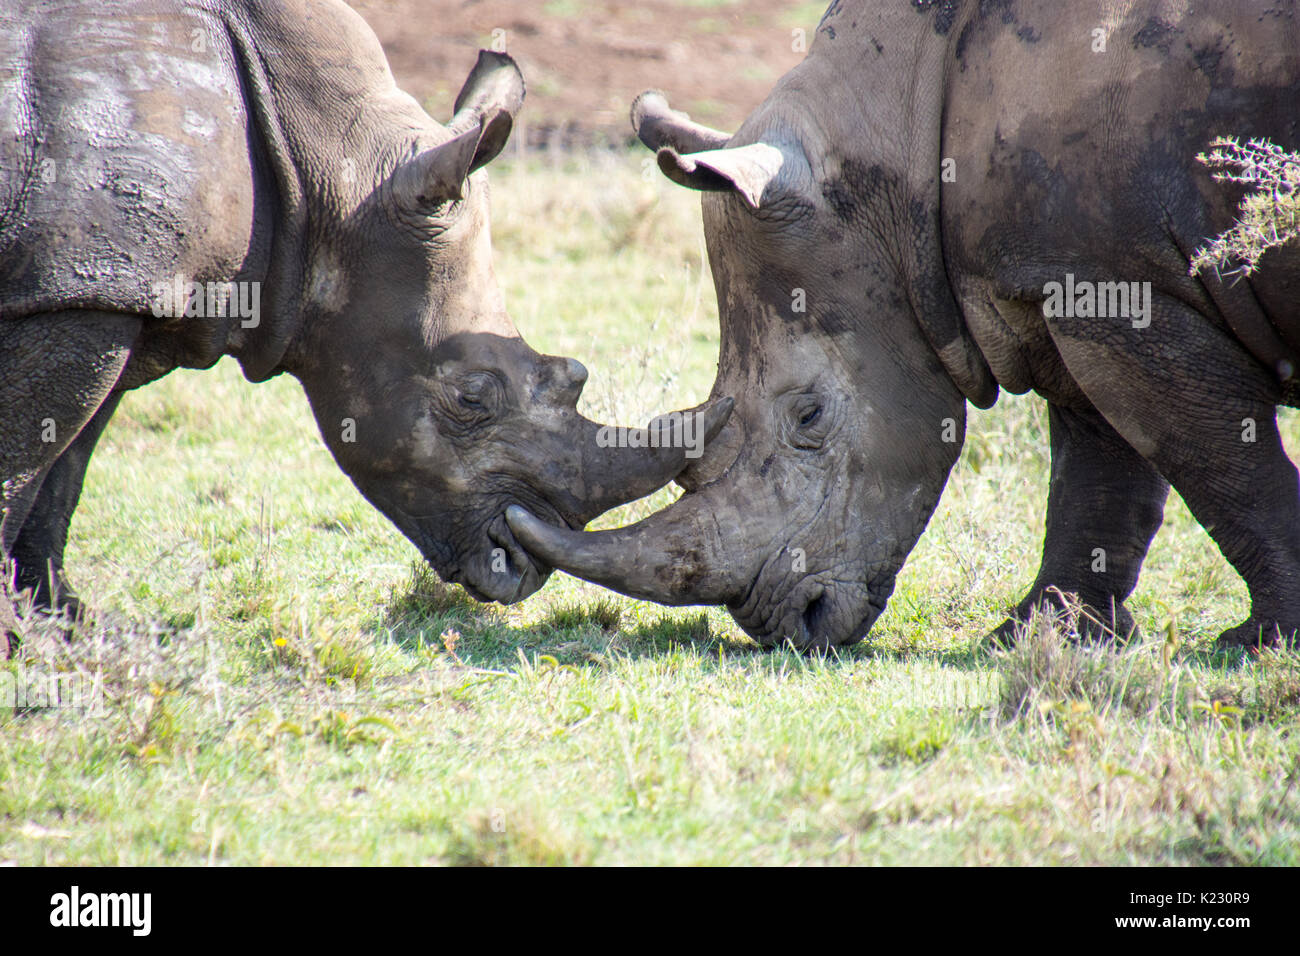 Fighting Rhinos - Stock Image